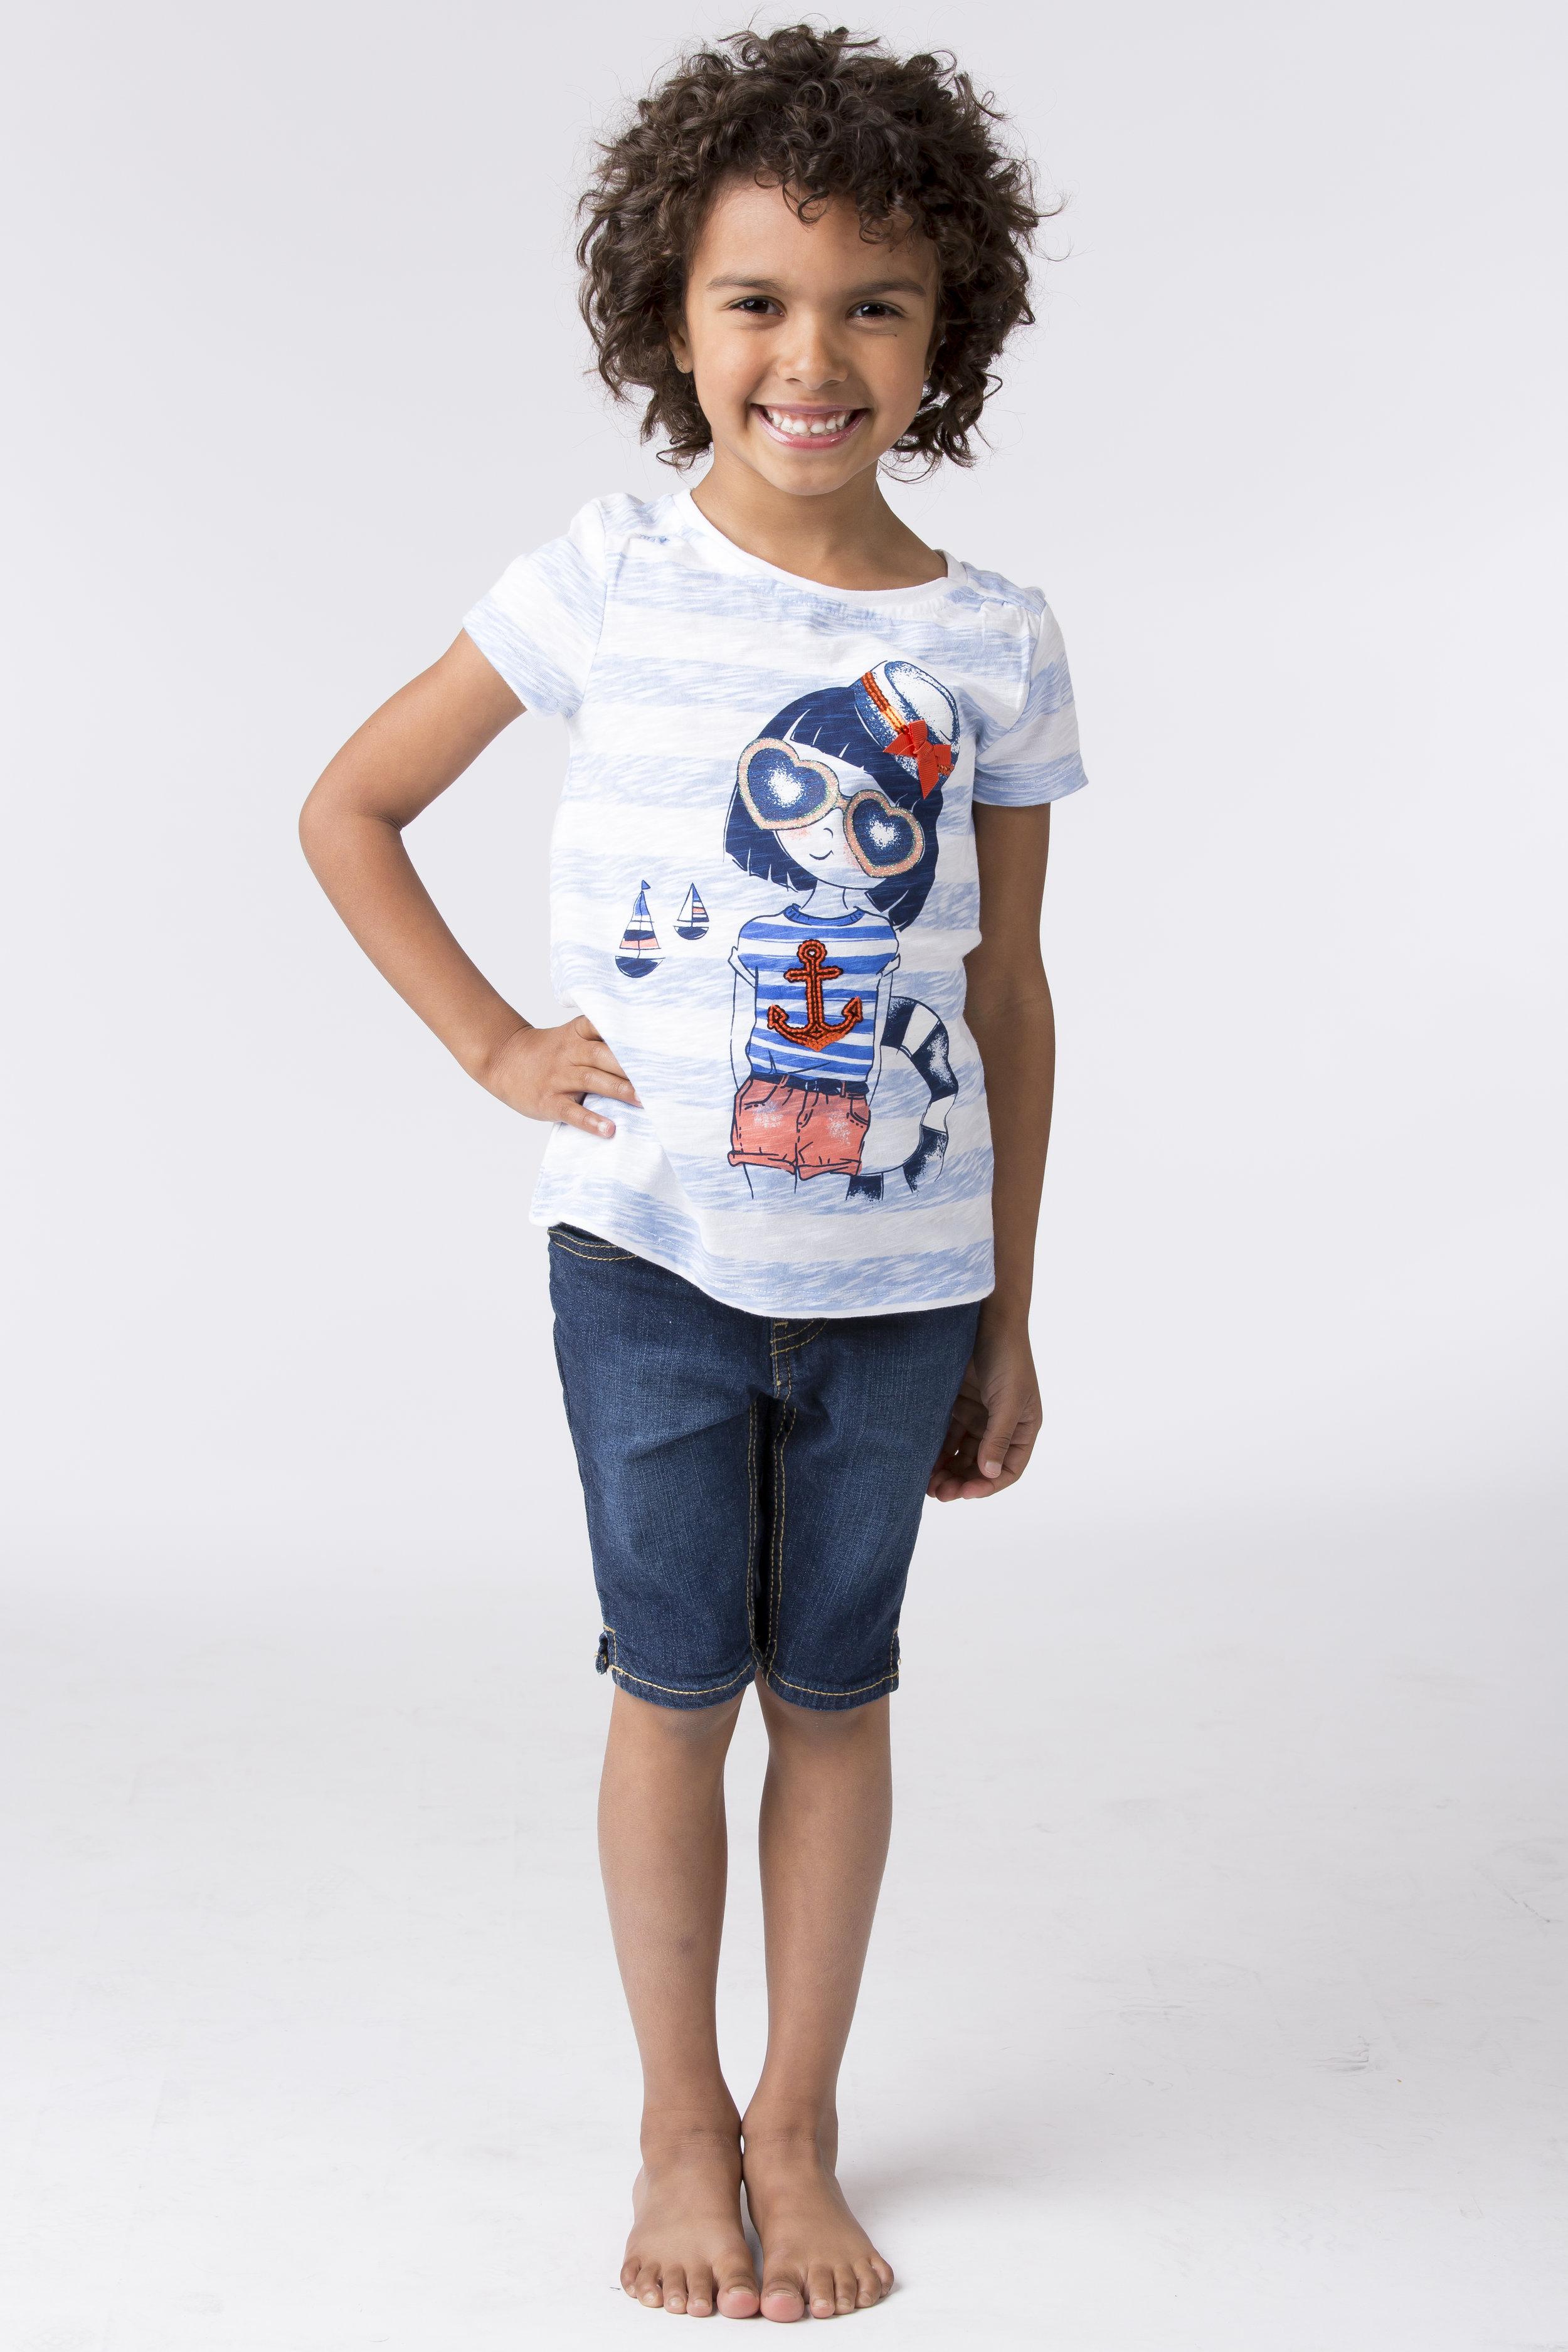 child-modeling-photography-portfolio-portland-or-vancouver-wa-MA3